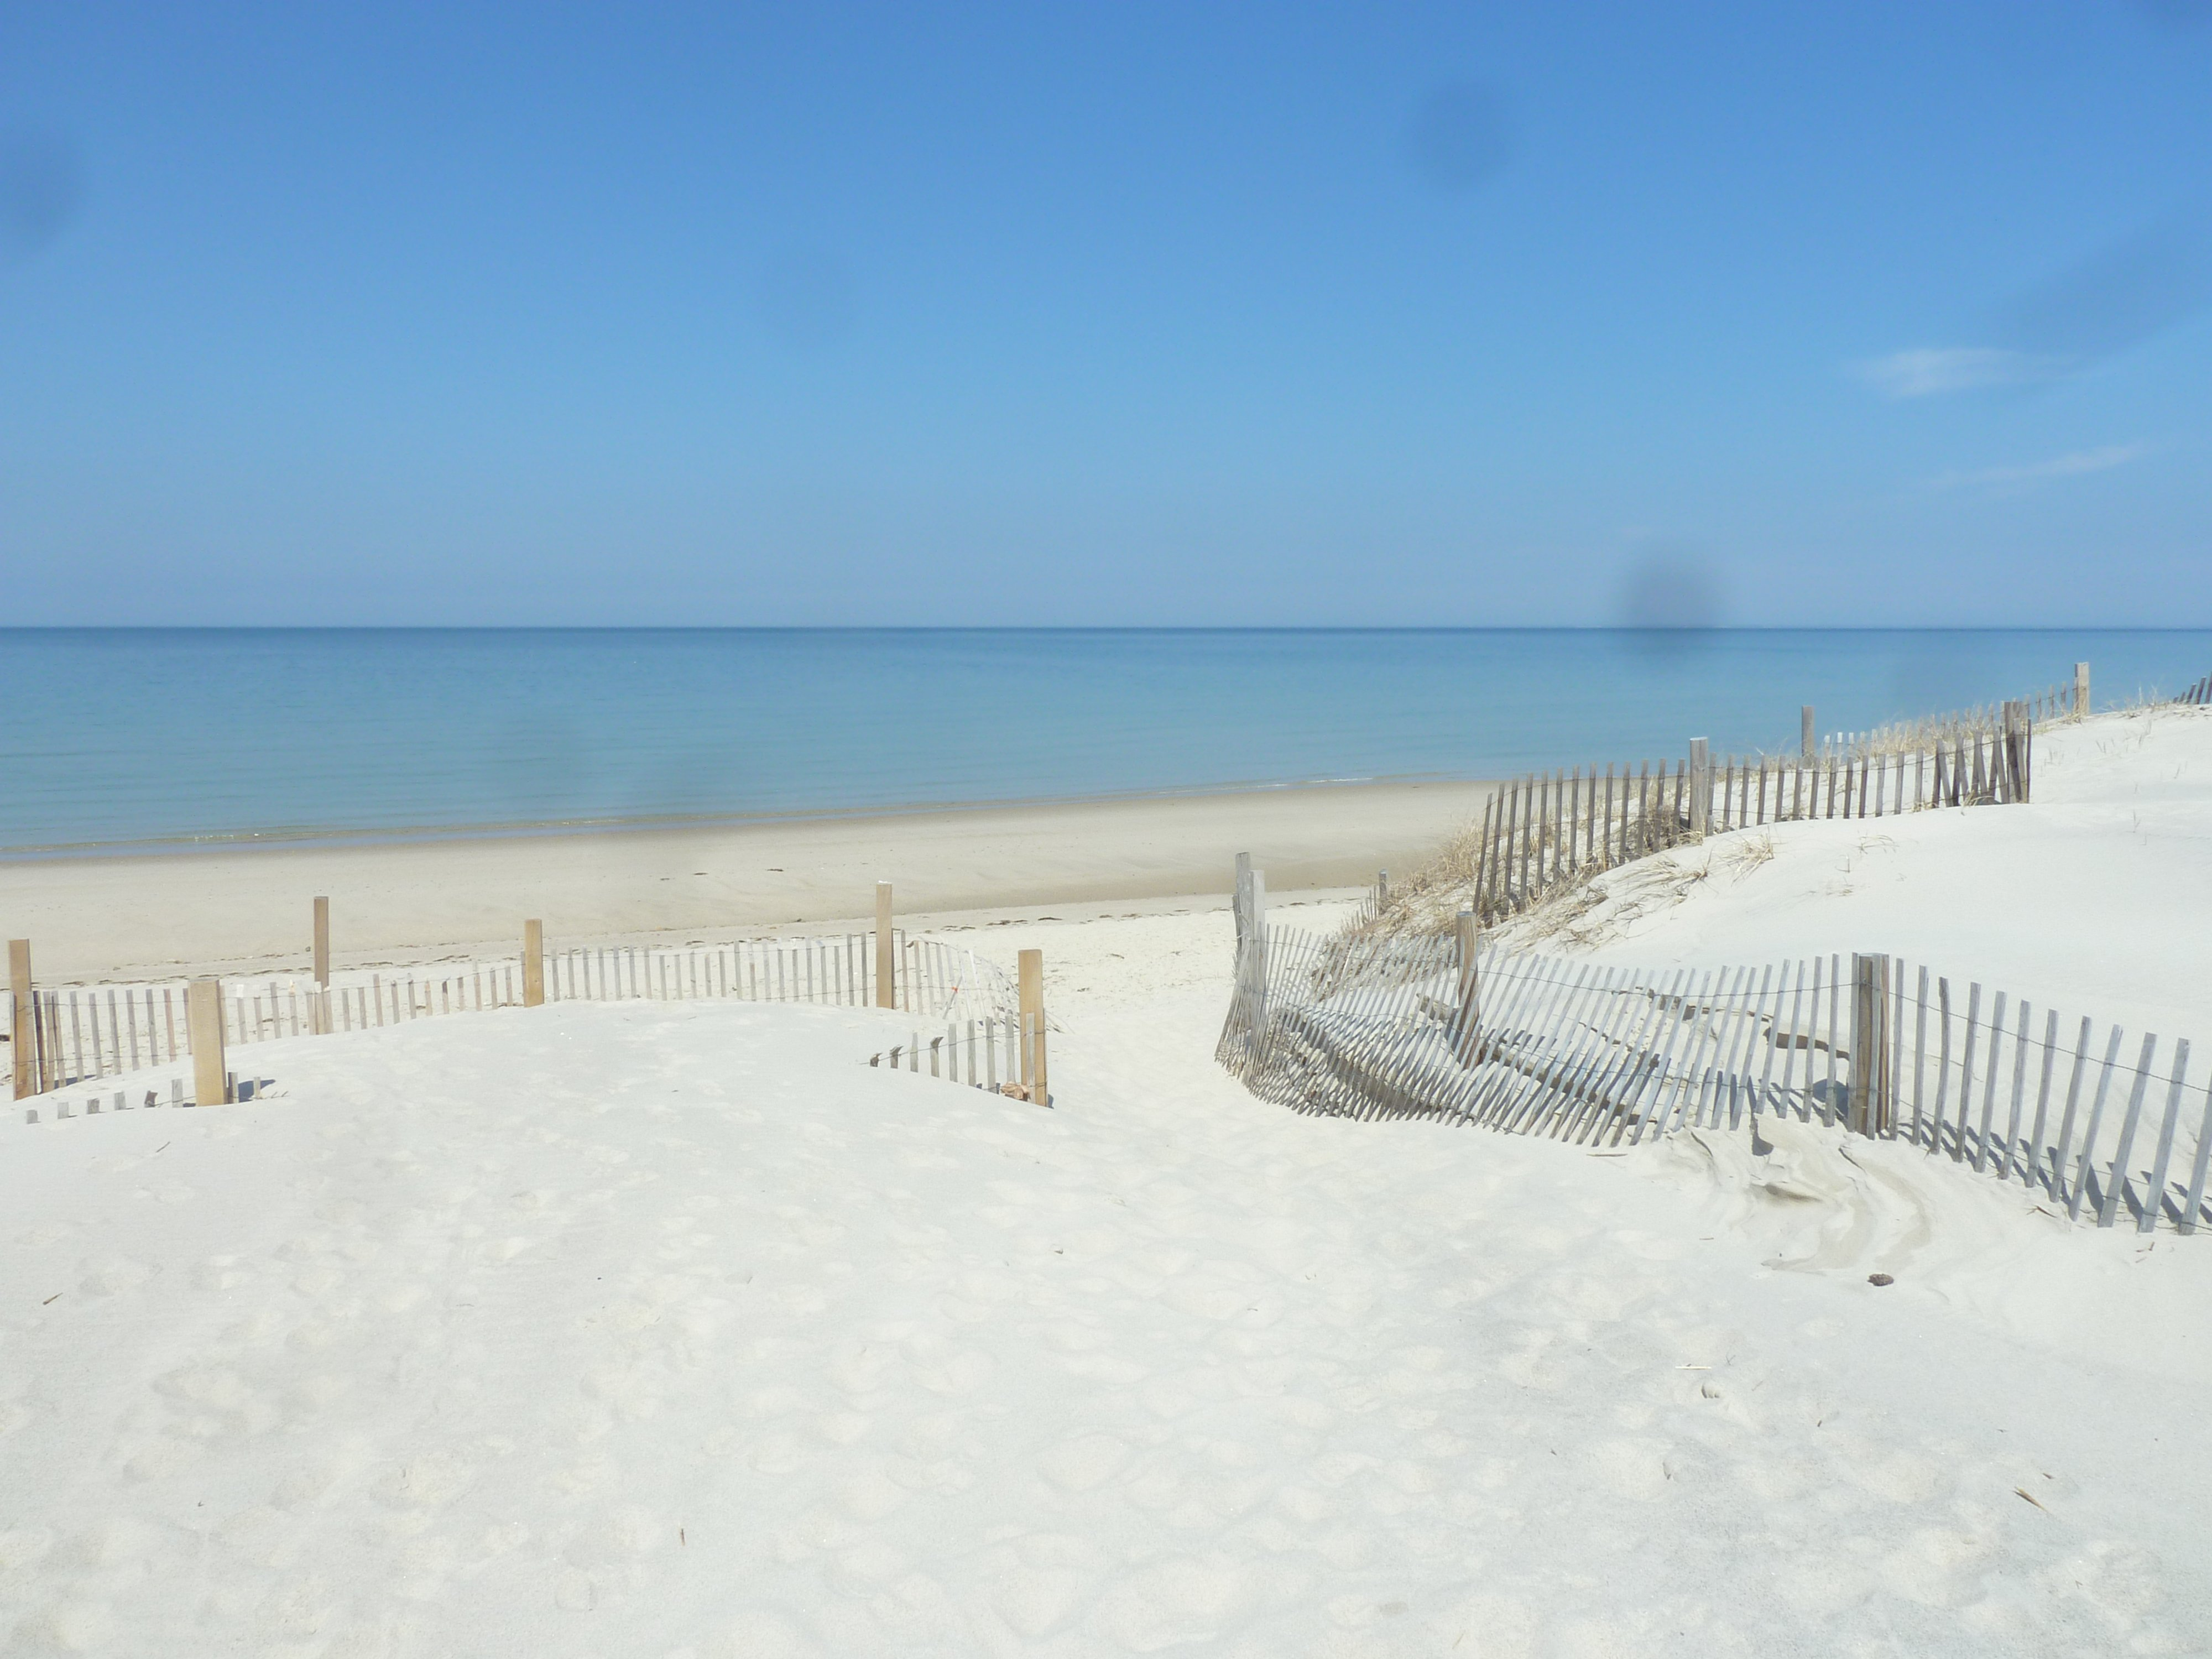 & Cold Storage Beach - Dennis MA view-1